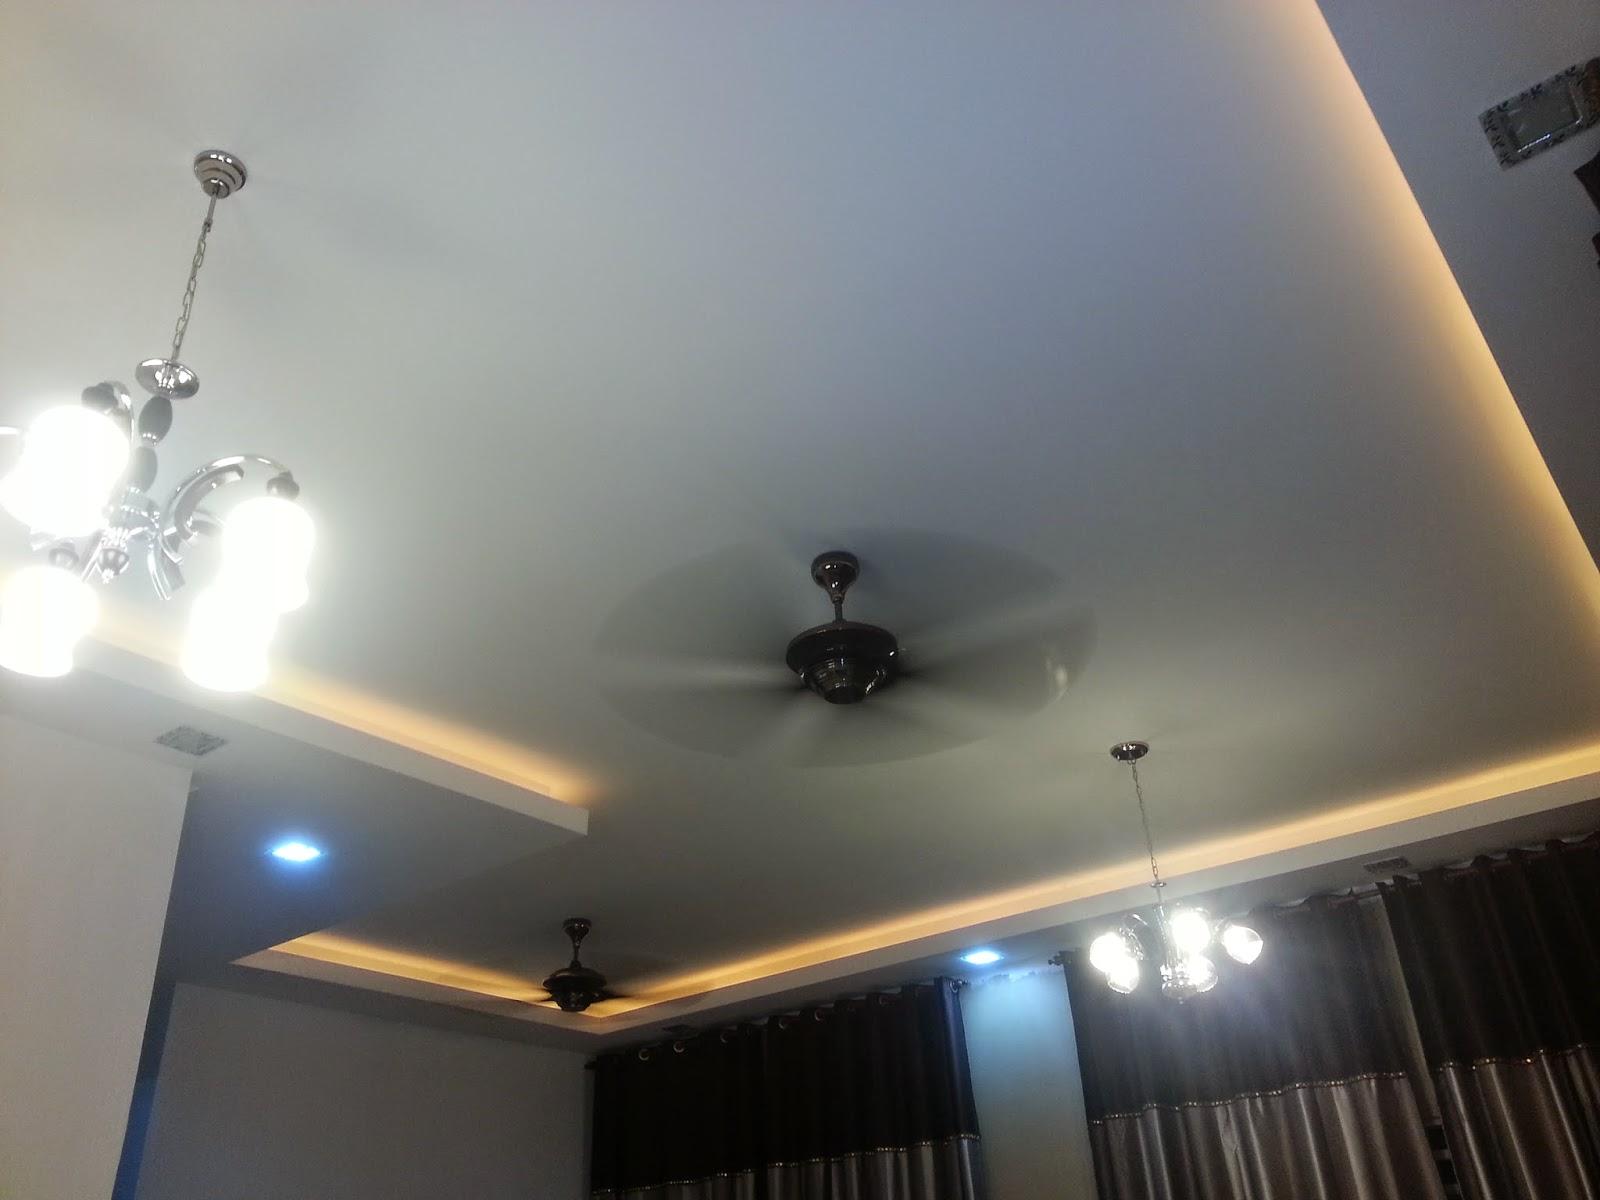 Diari Si Ketam Batu Pengalaman Ubahsuai Rumah Baru Plaster Ceiling Wirering